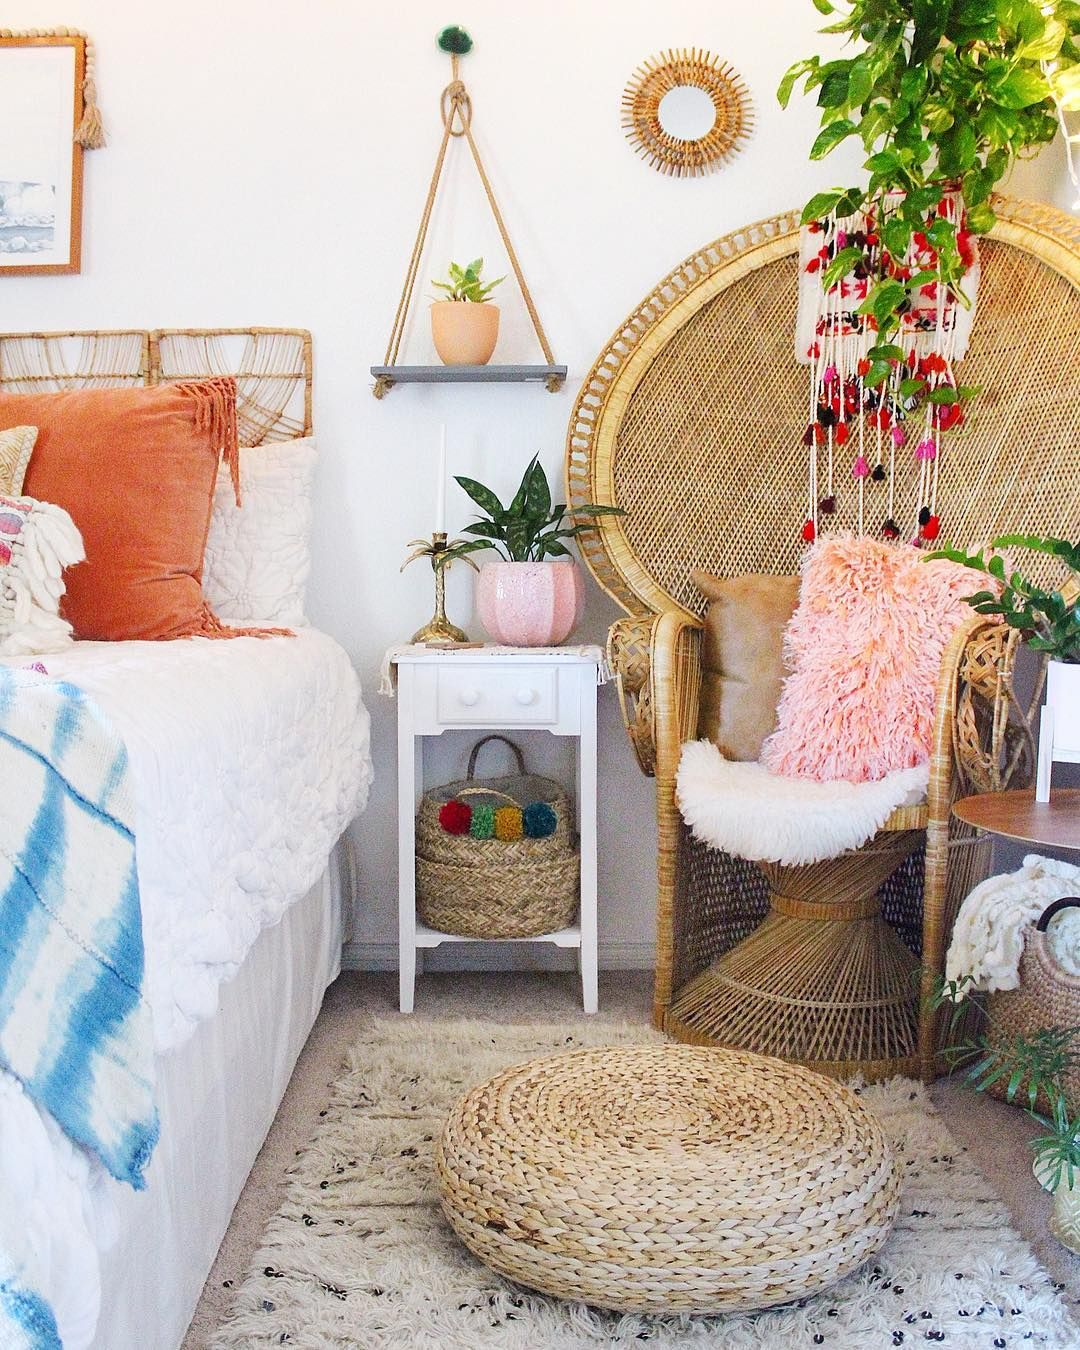 The Best Colorful Bedroom Ideas We Found On Instagram Bedroom Vintage Bedroom Design Home Decor Bedroom